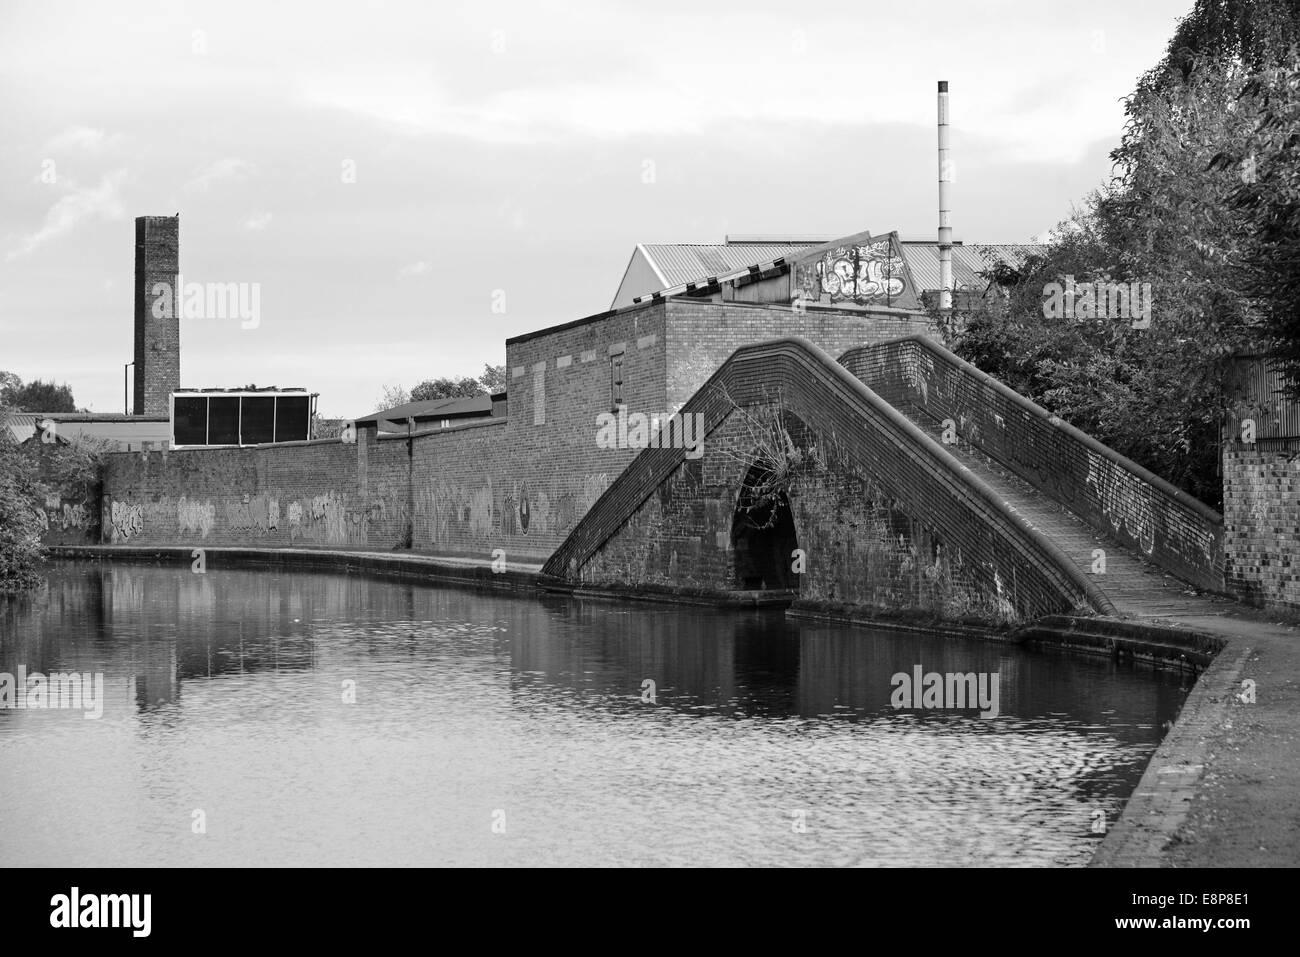 Birmingham Canal - Stock Image